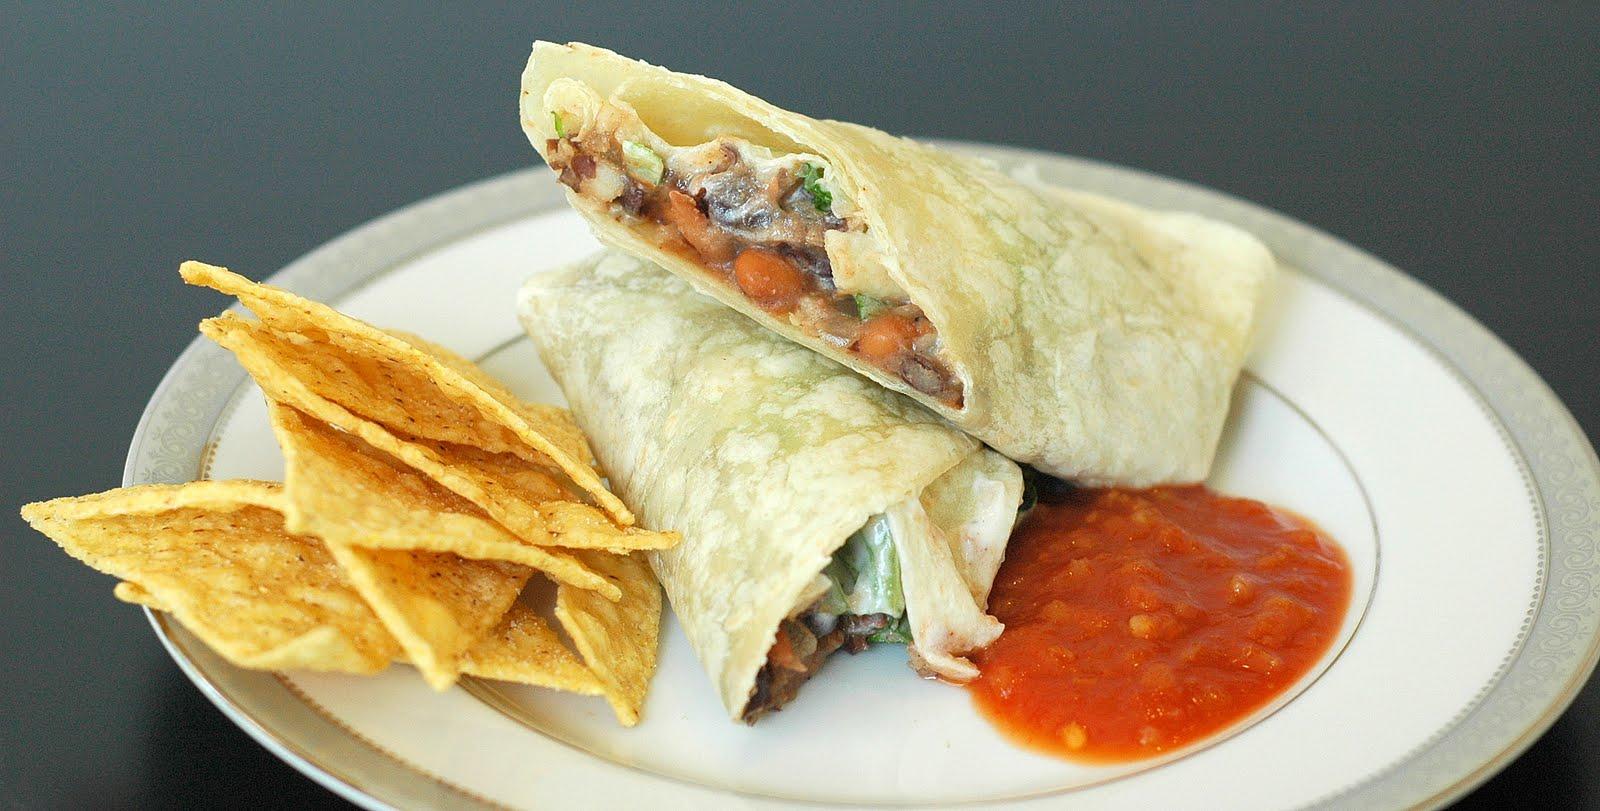 Good Thymes and Good Food: Easy Bean Burritos